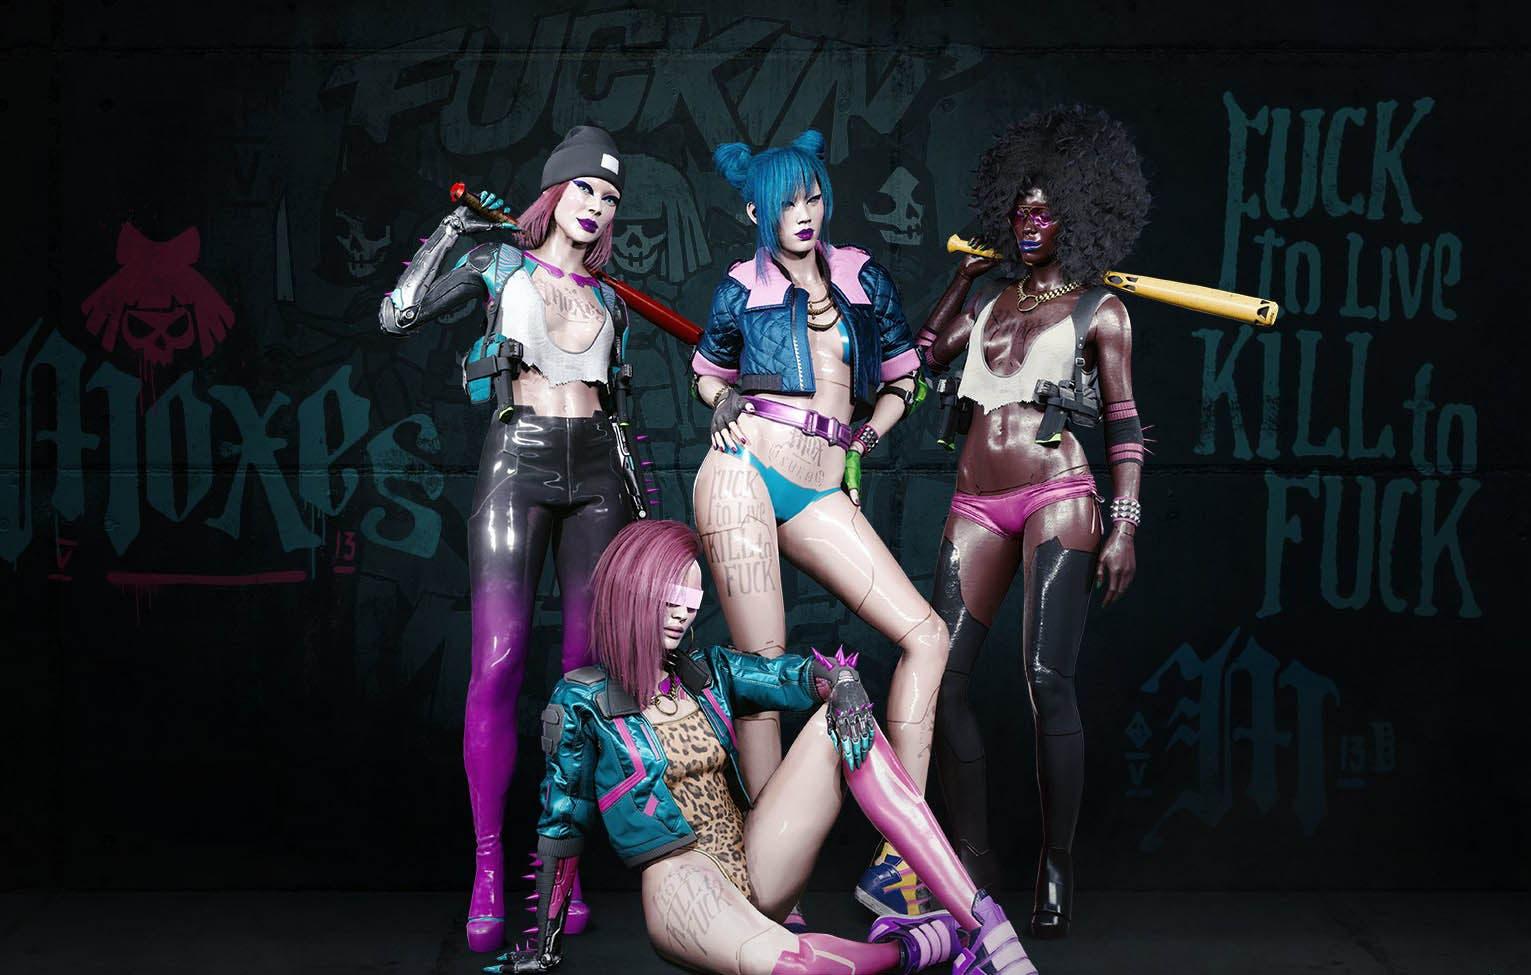 Las bandas de Cyberpunk 2077 protagonizan estos espectaculares fondos de pantalla 7